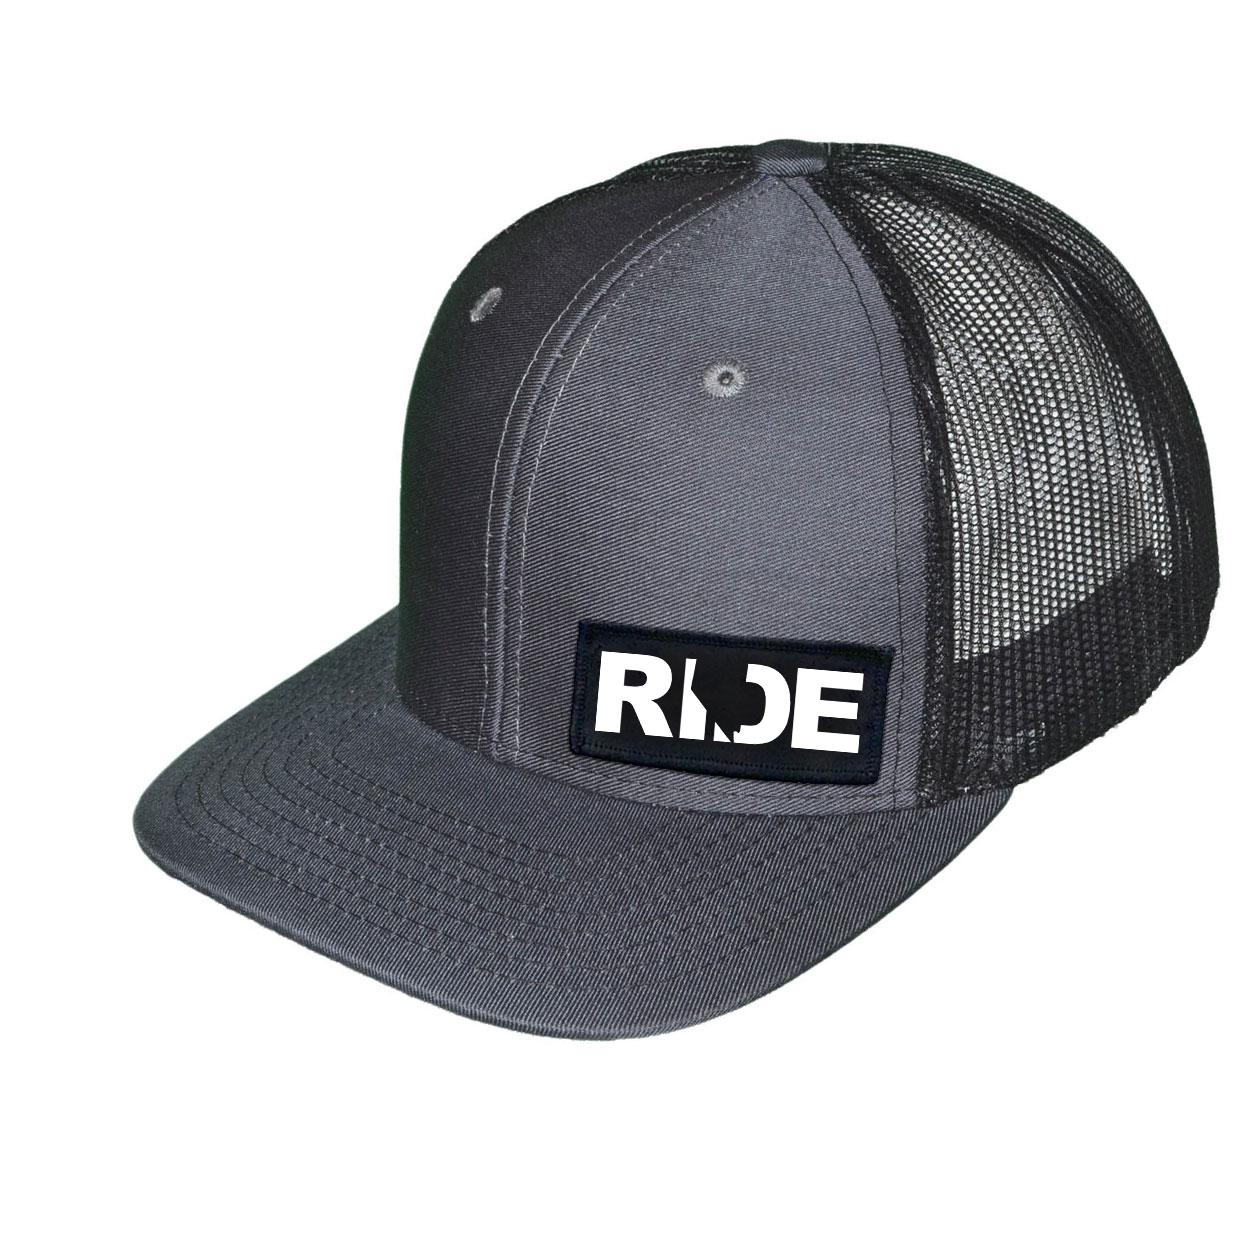 Ride Nevada Night Out Woven Patch Snapback Trucker Hat Dark Gray/Black (White Logo)